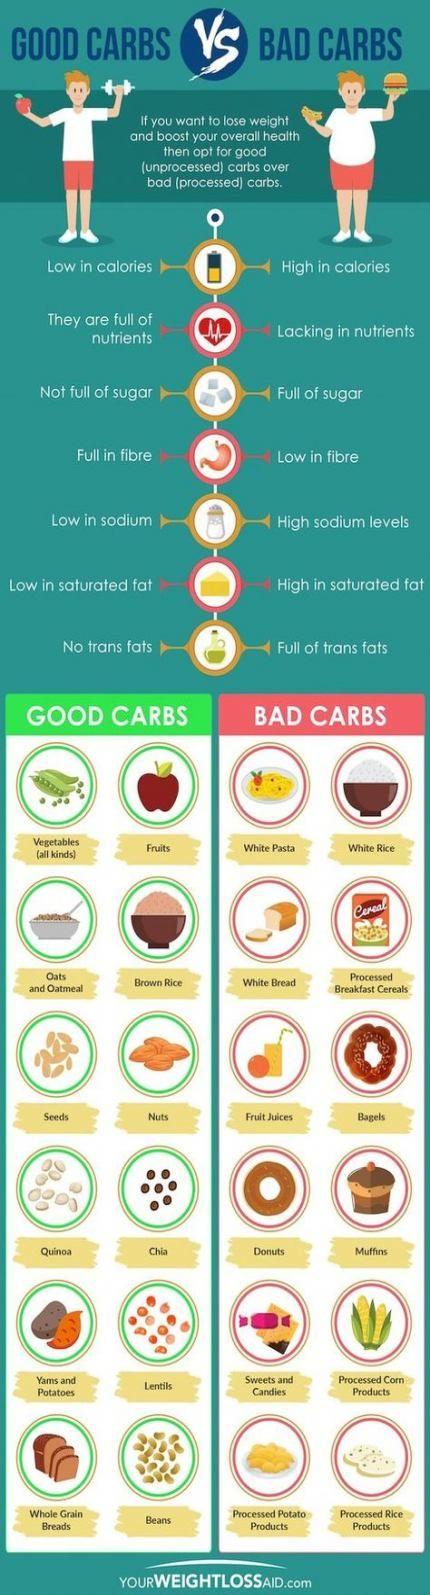 Fitness Food Design Weight Loss 51 Ideas #food #fitness #design